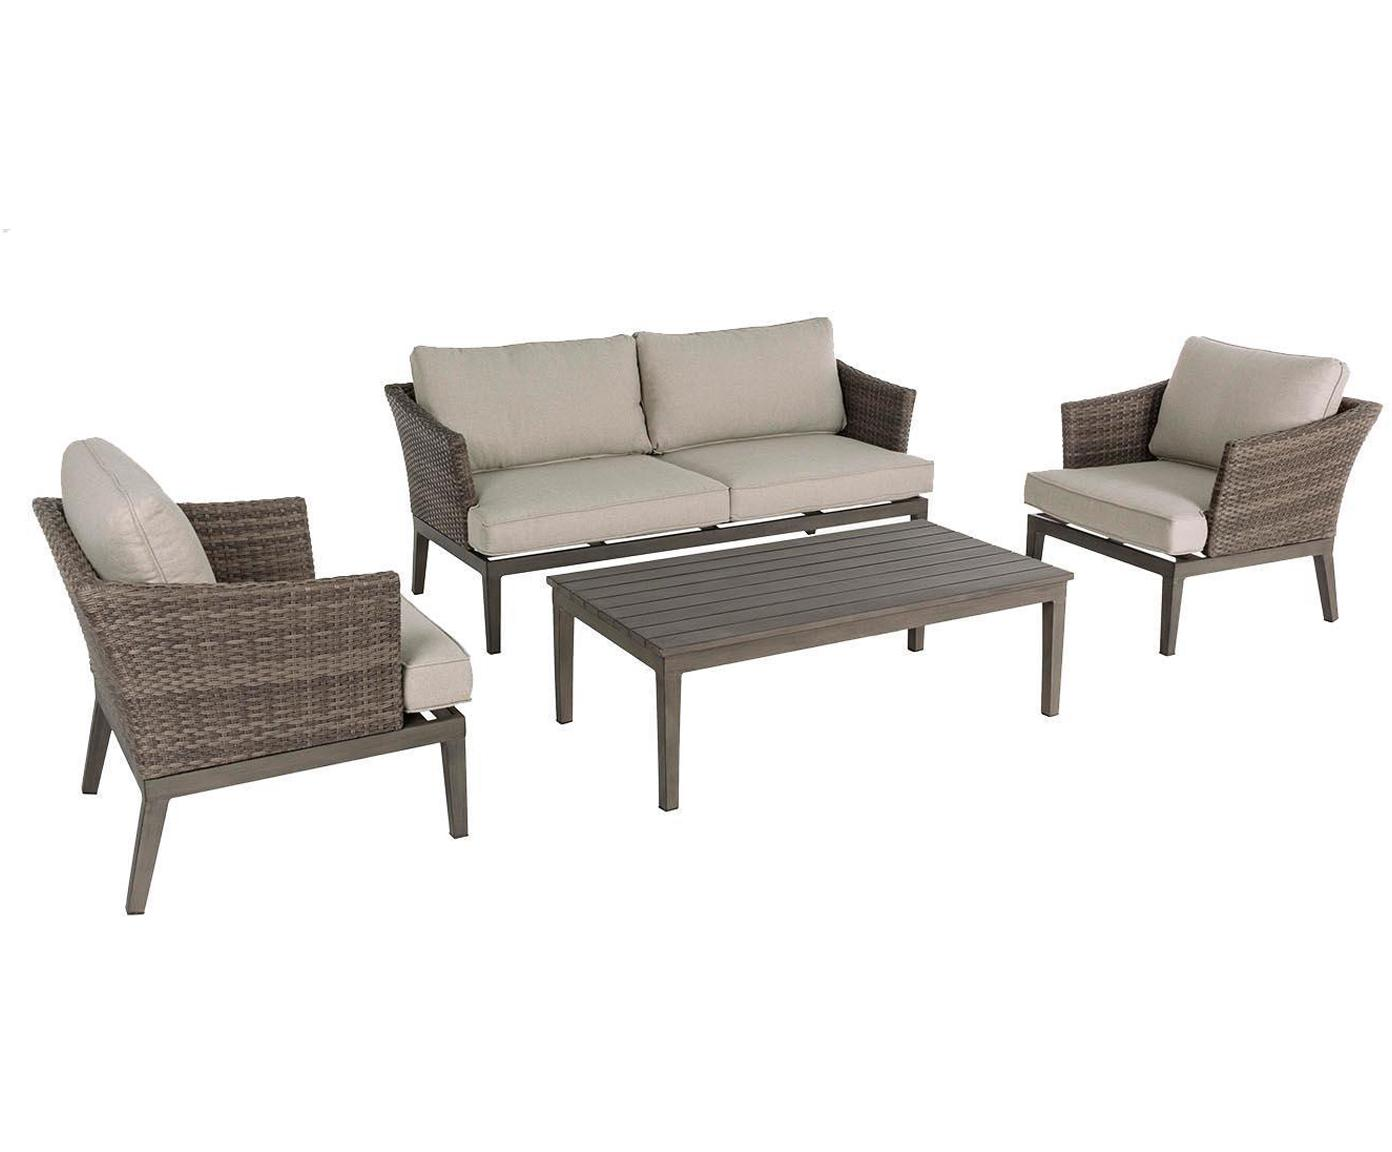 Set lounge de exterior Coconut, 4 pzas., Aluminio Poliéster Fibra sintética, Gris, marrón, Sondergrößen